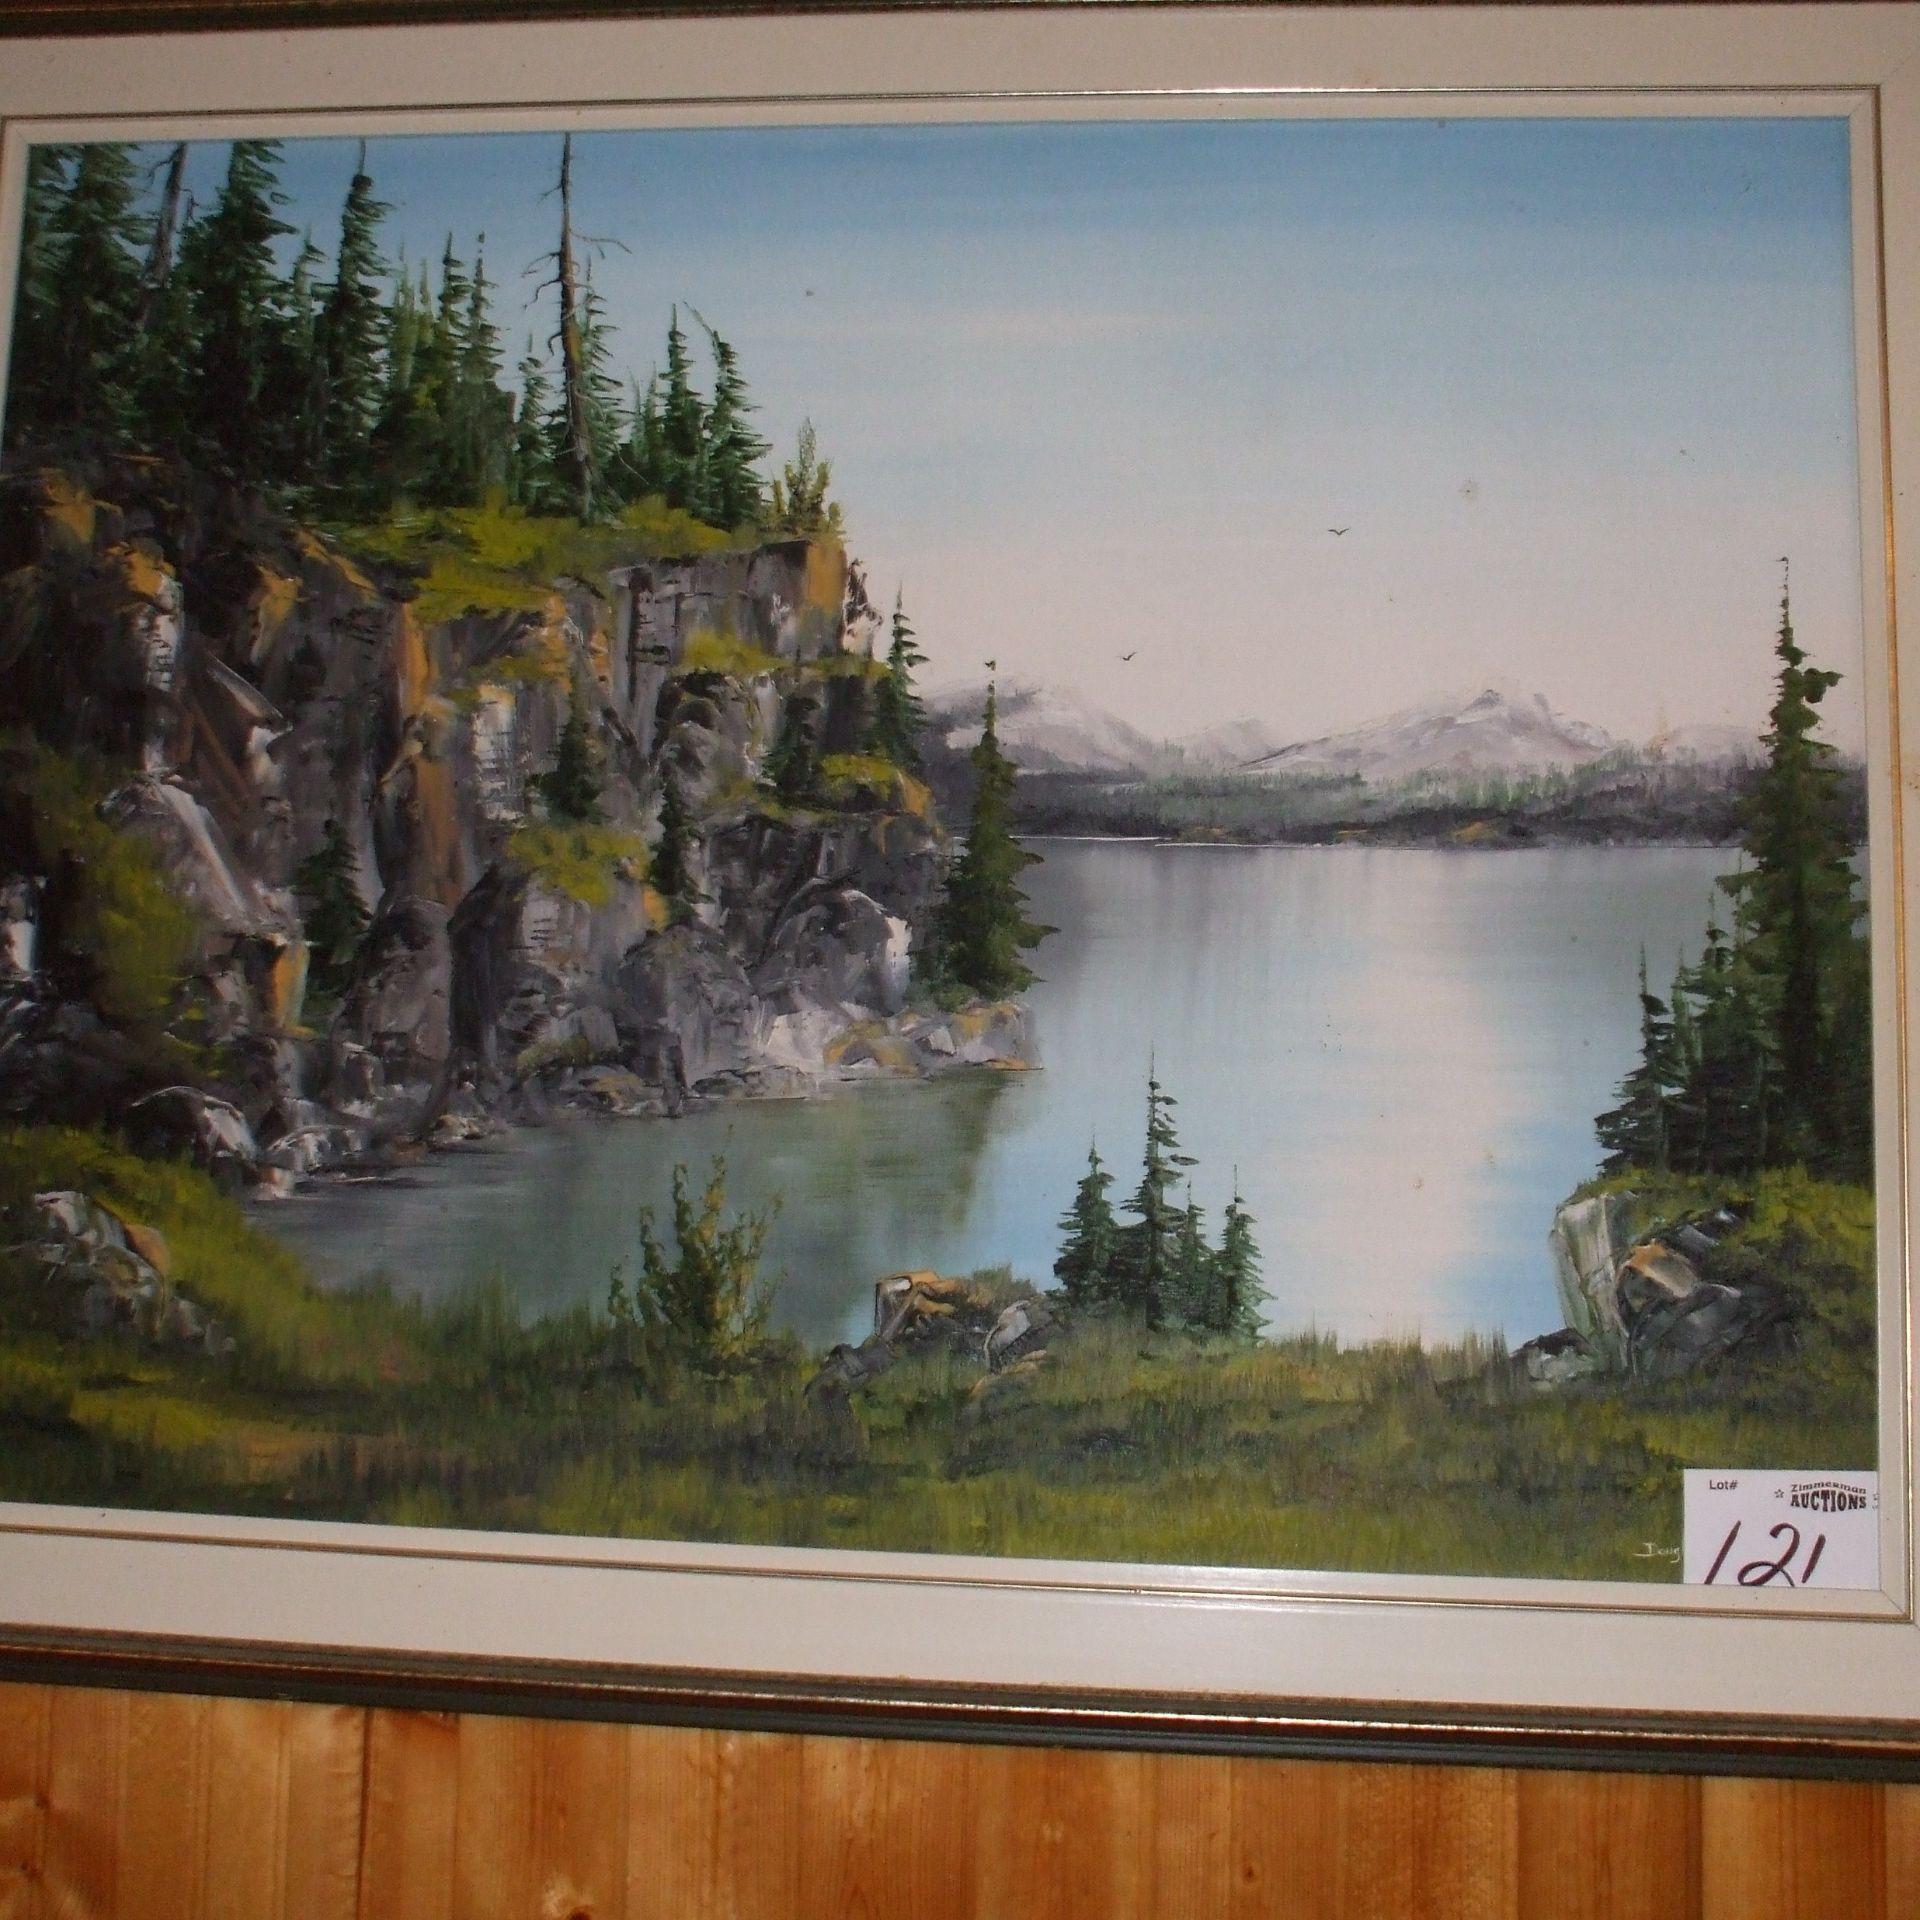 Painting - Douglas Jones - Horsefly lake